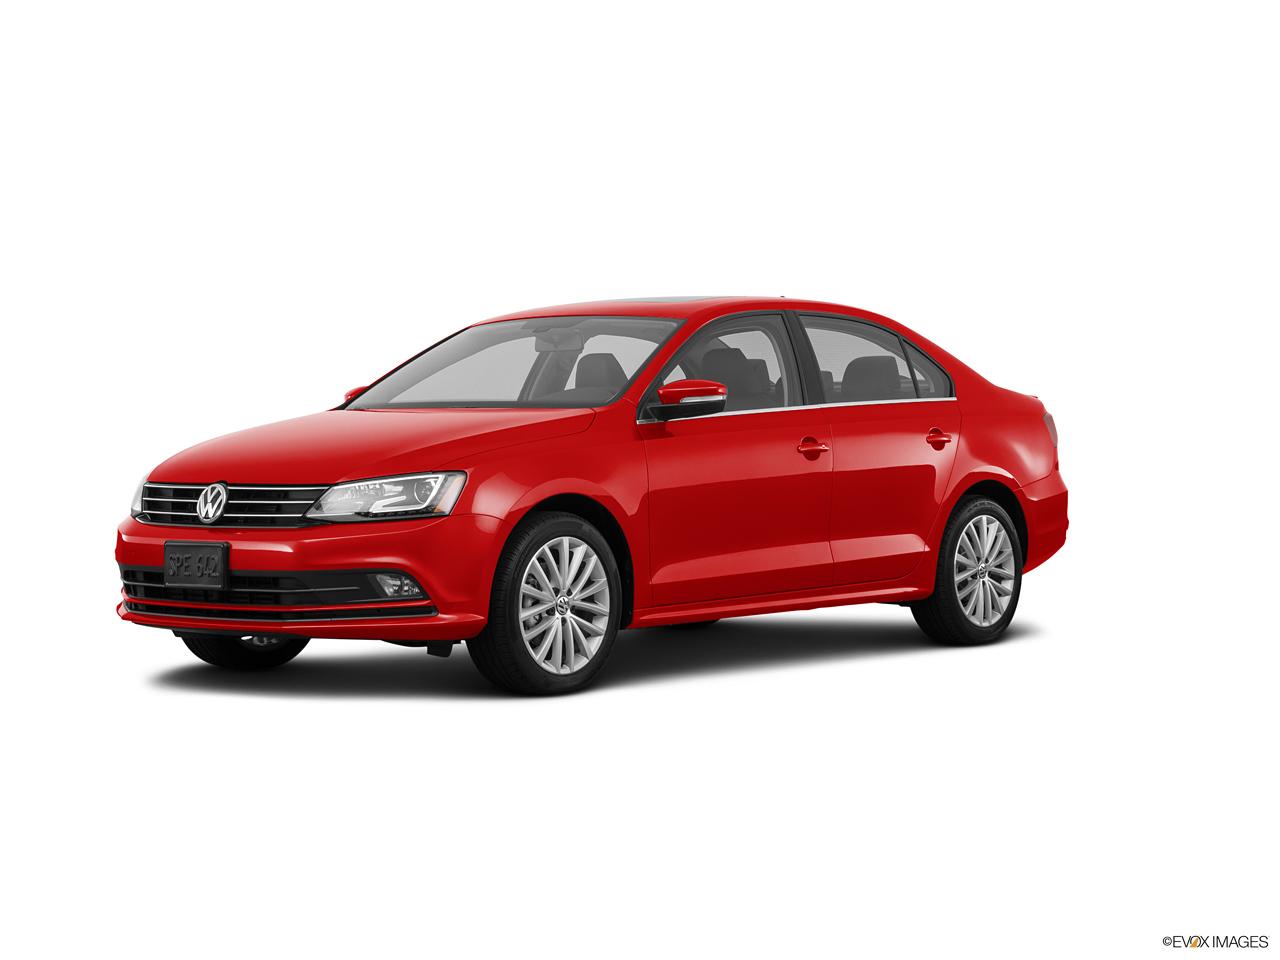 Car Pictures List For Volkswagen Jetta 2016 2 0 S Uae